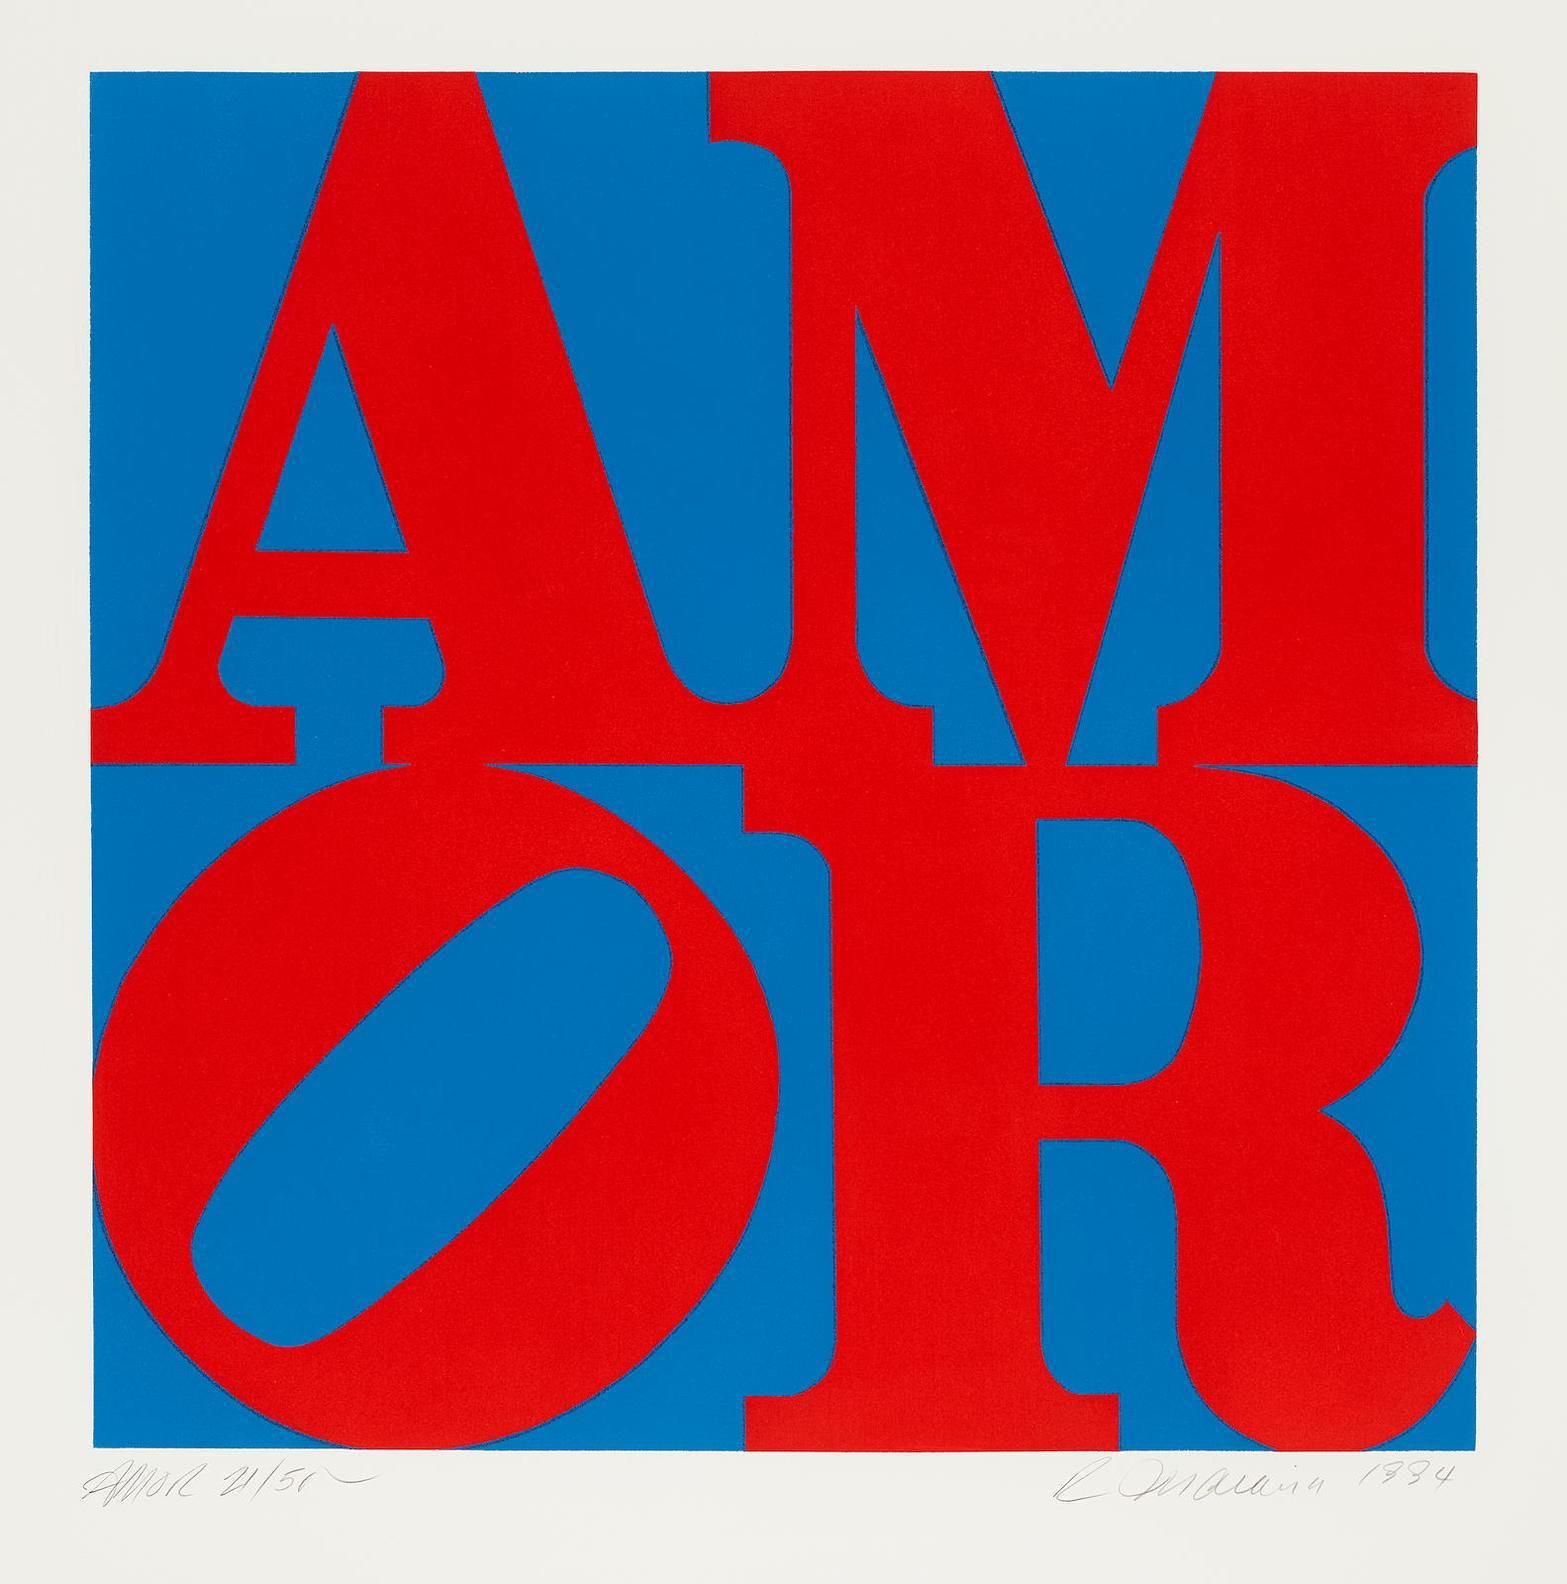 Robert Indiana-Amor-1994